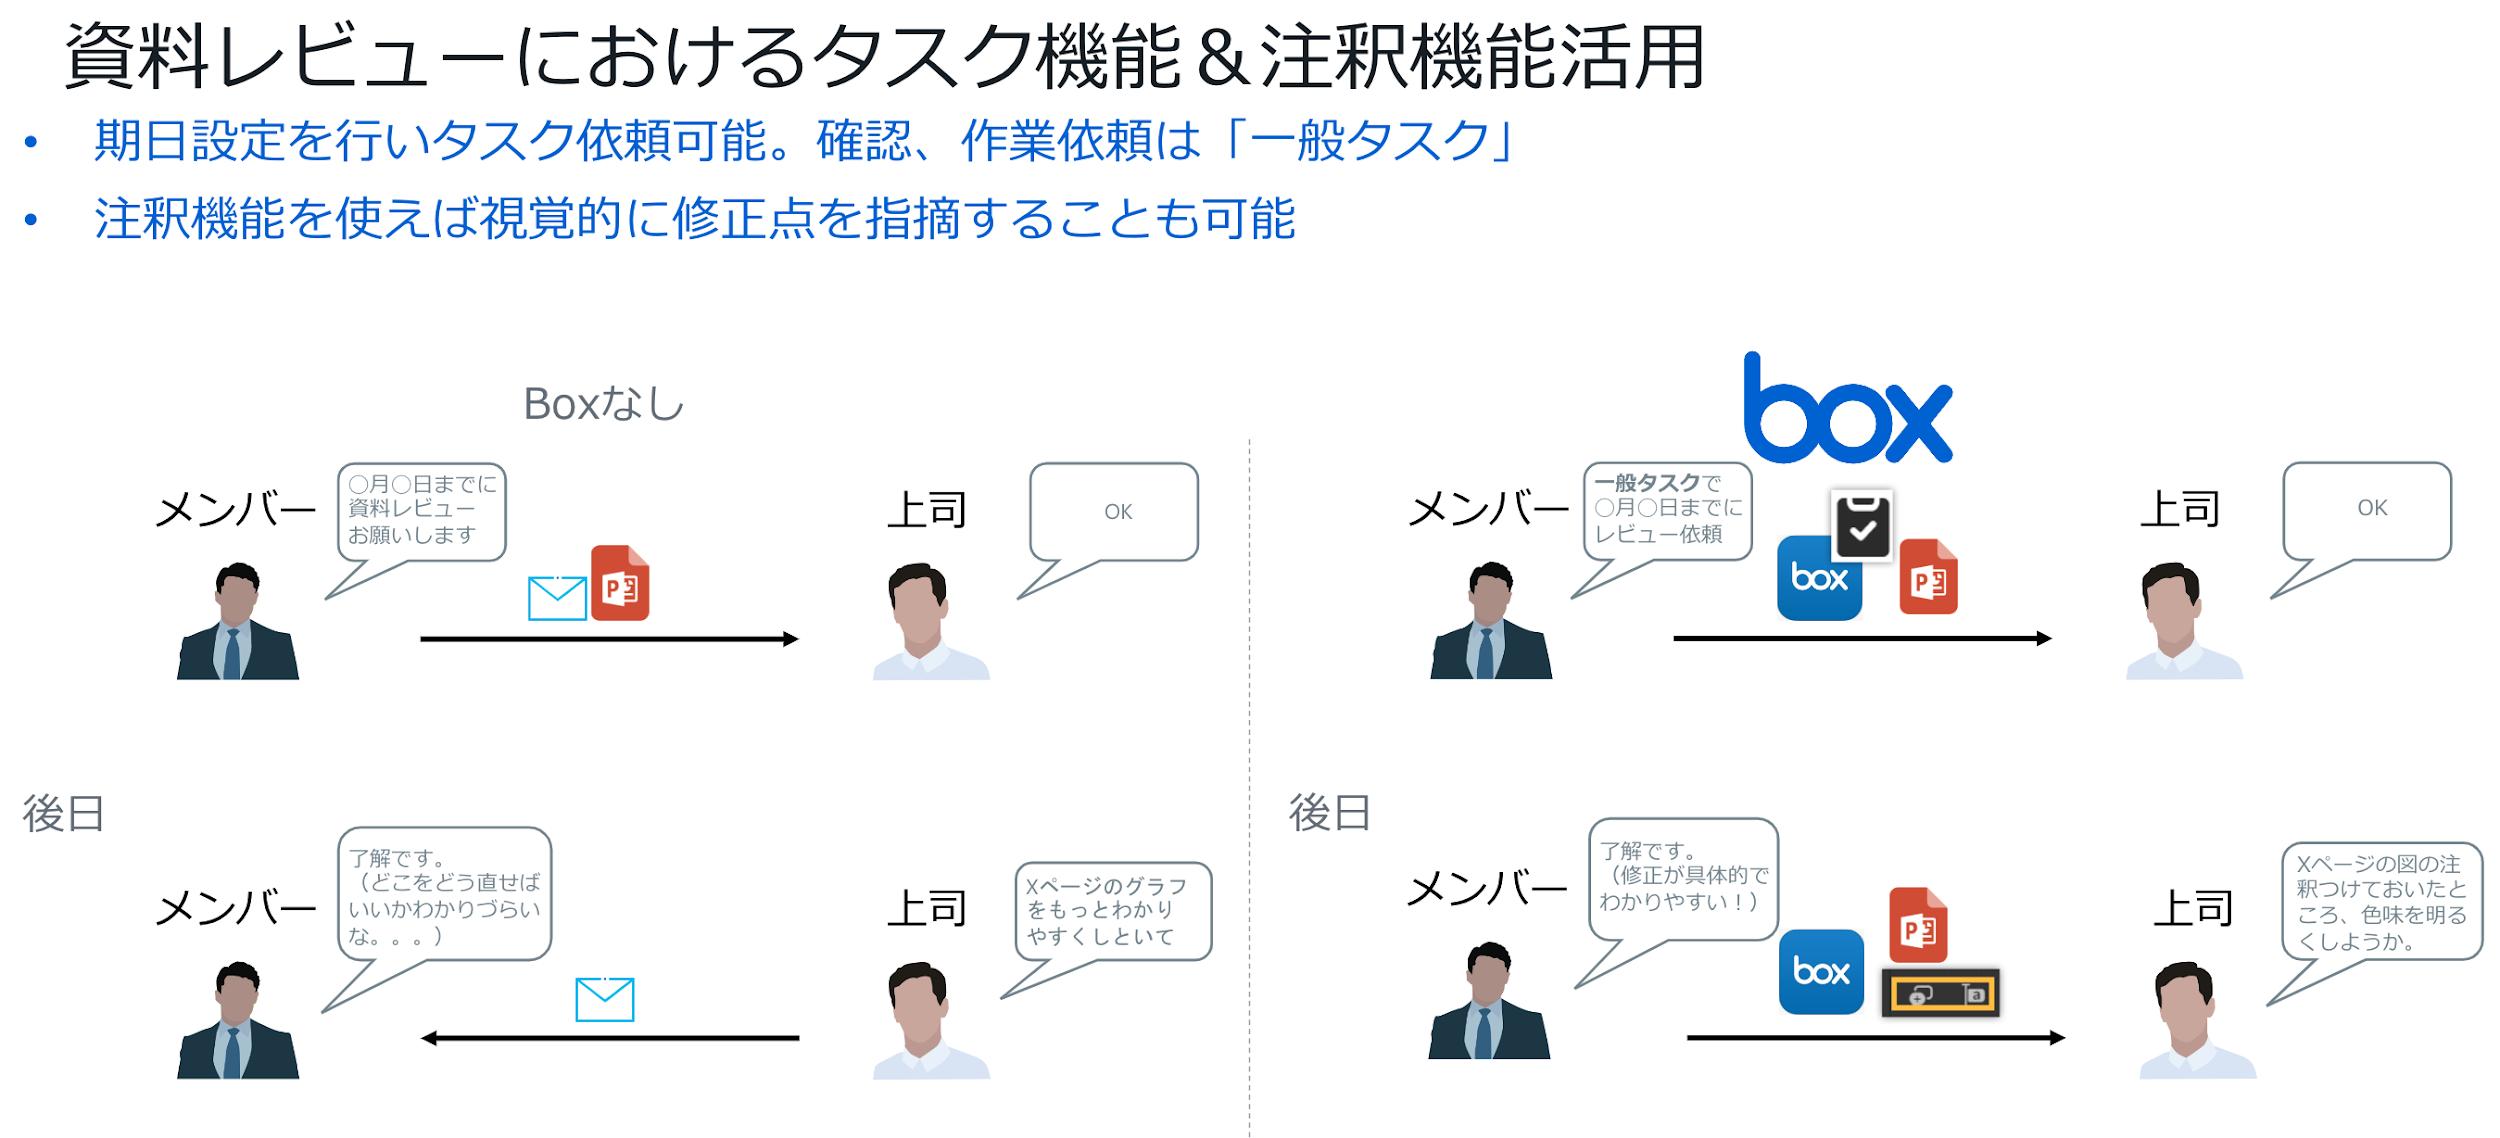 bjcc-12th-meetup-report-06